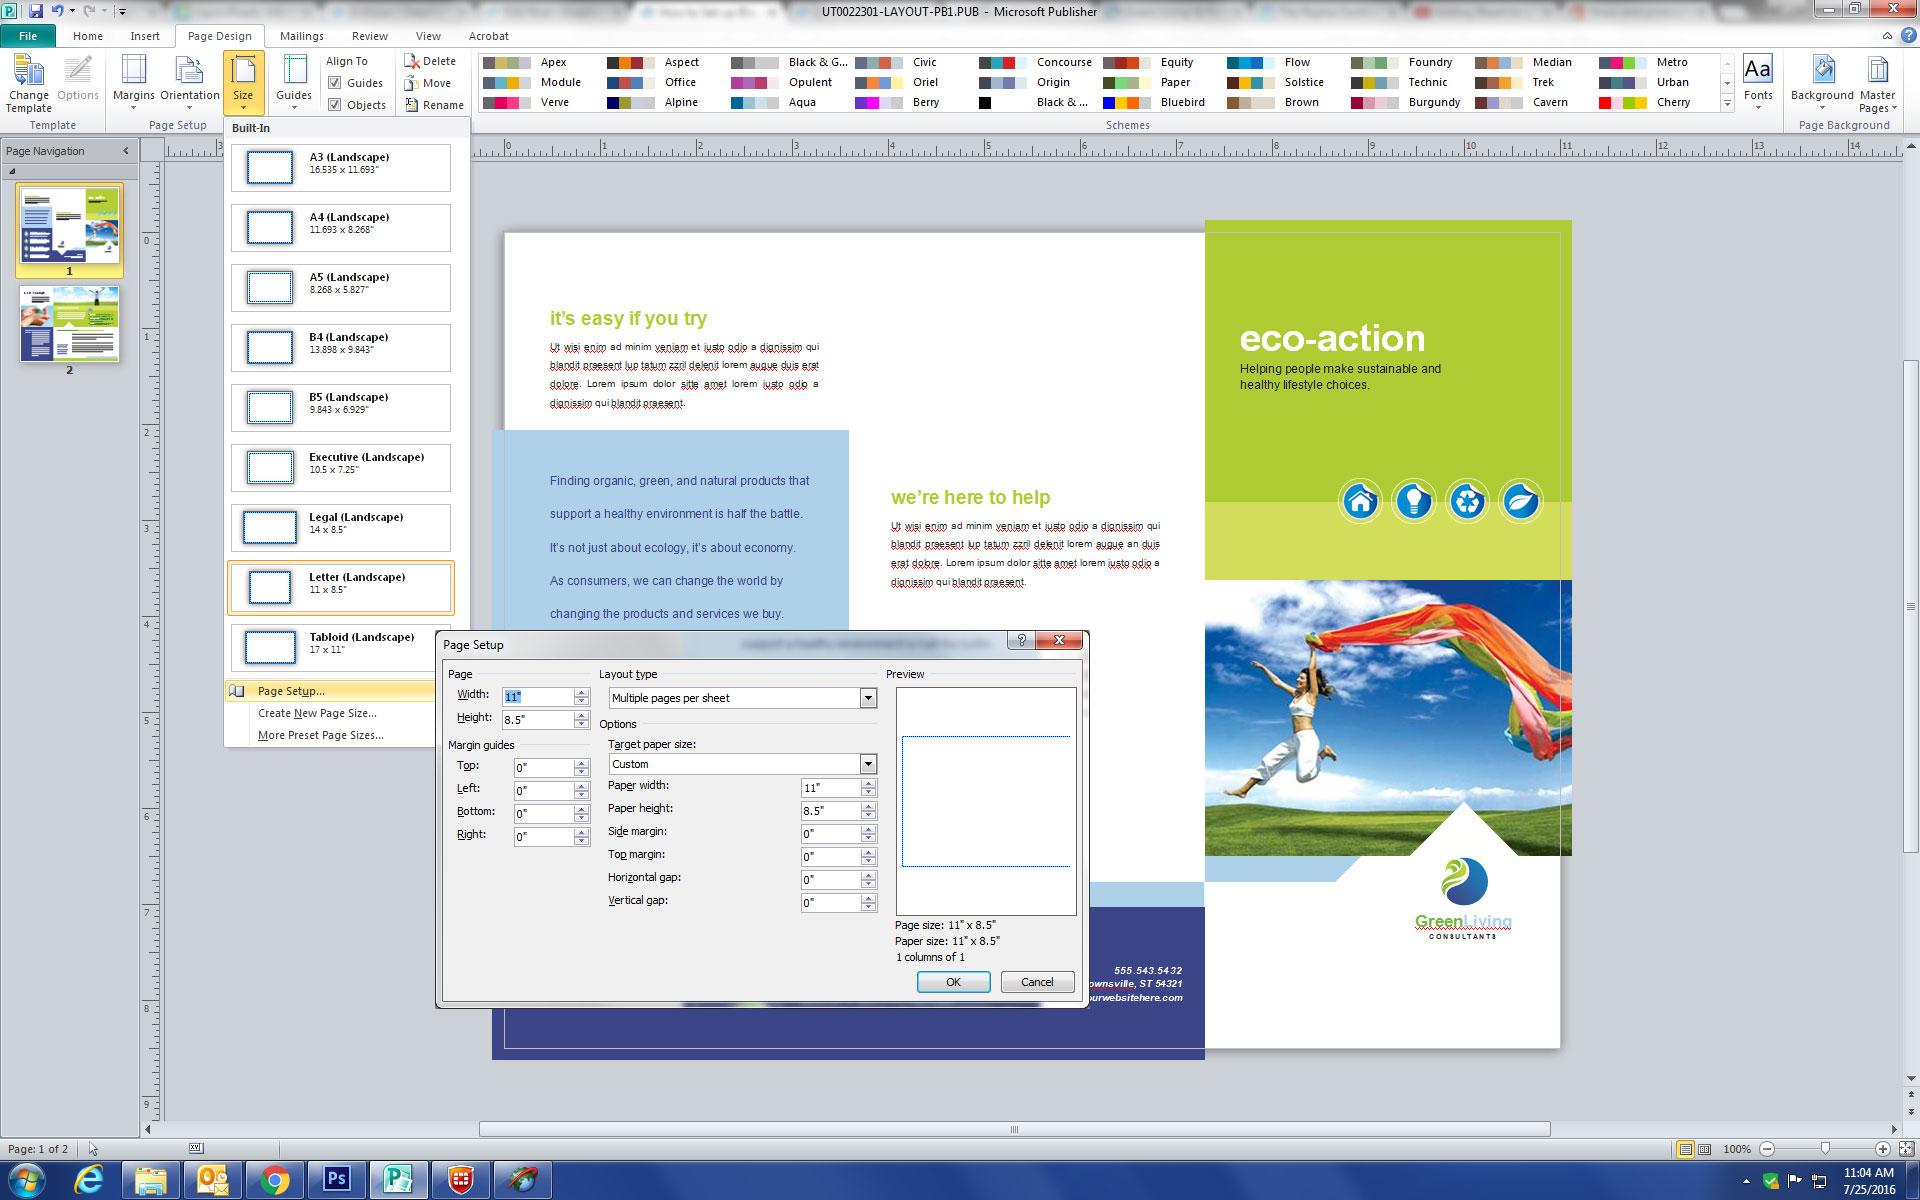 Microsoft Publisher Page Setup Document Size